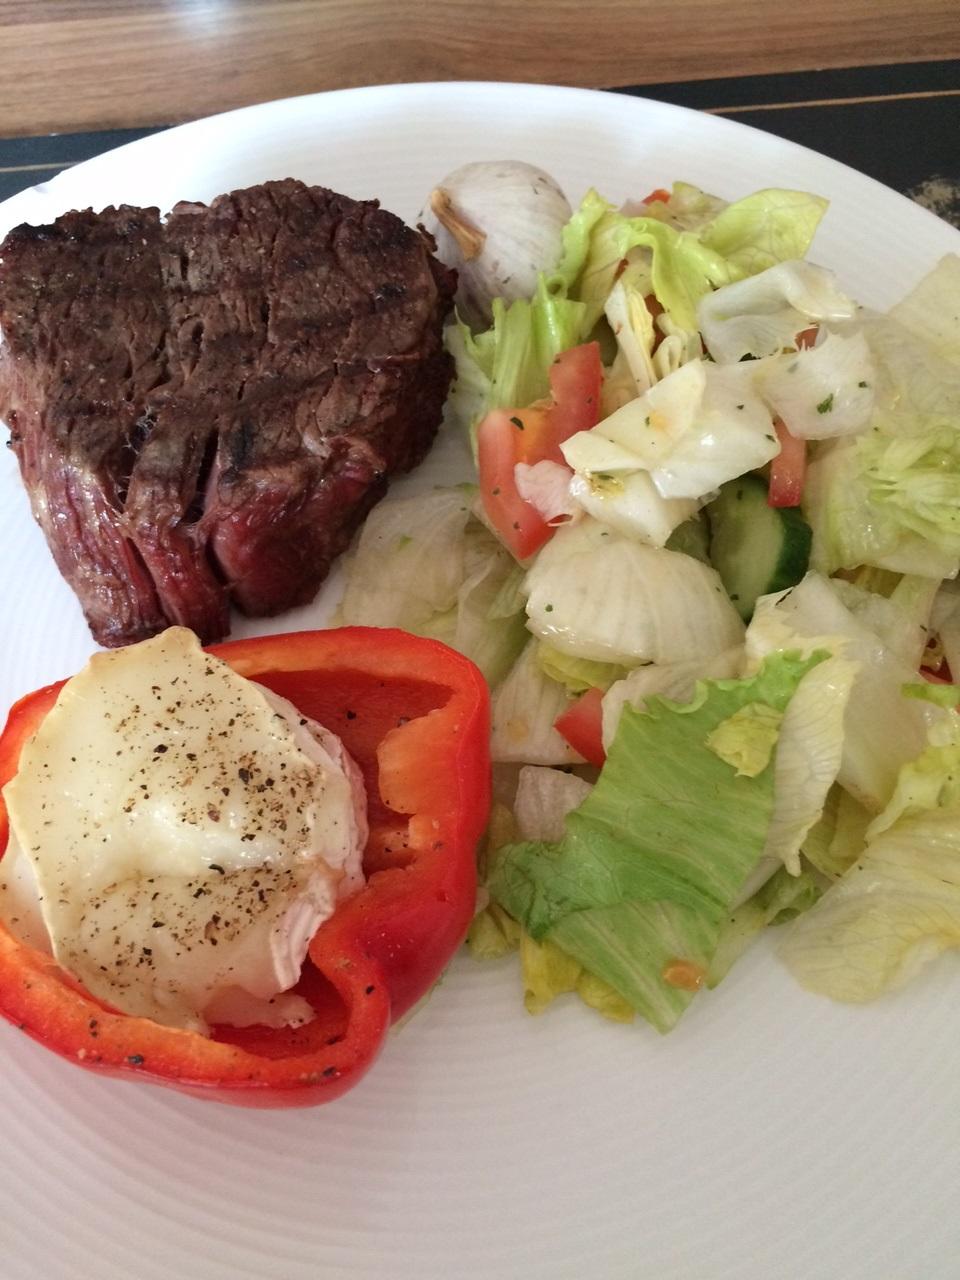 Dagens grill: Oxfilé med getostfyllda paprikor